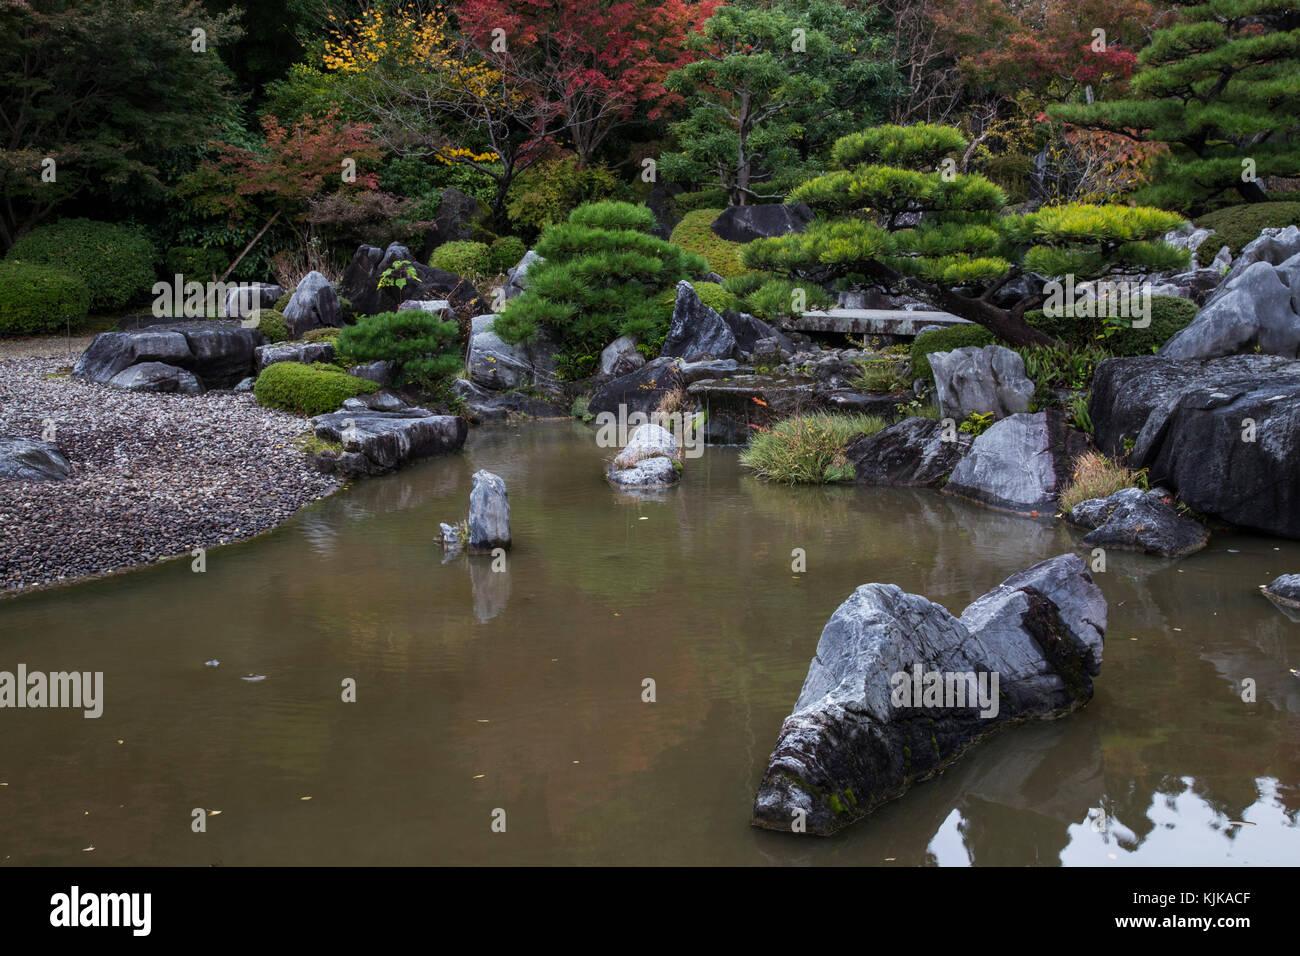 Inner Temple Garden Stock Photos & Inner Temple Garden Stock Images ...